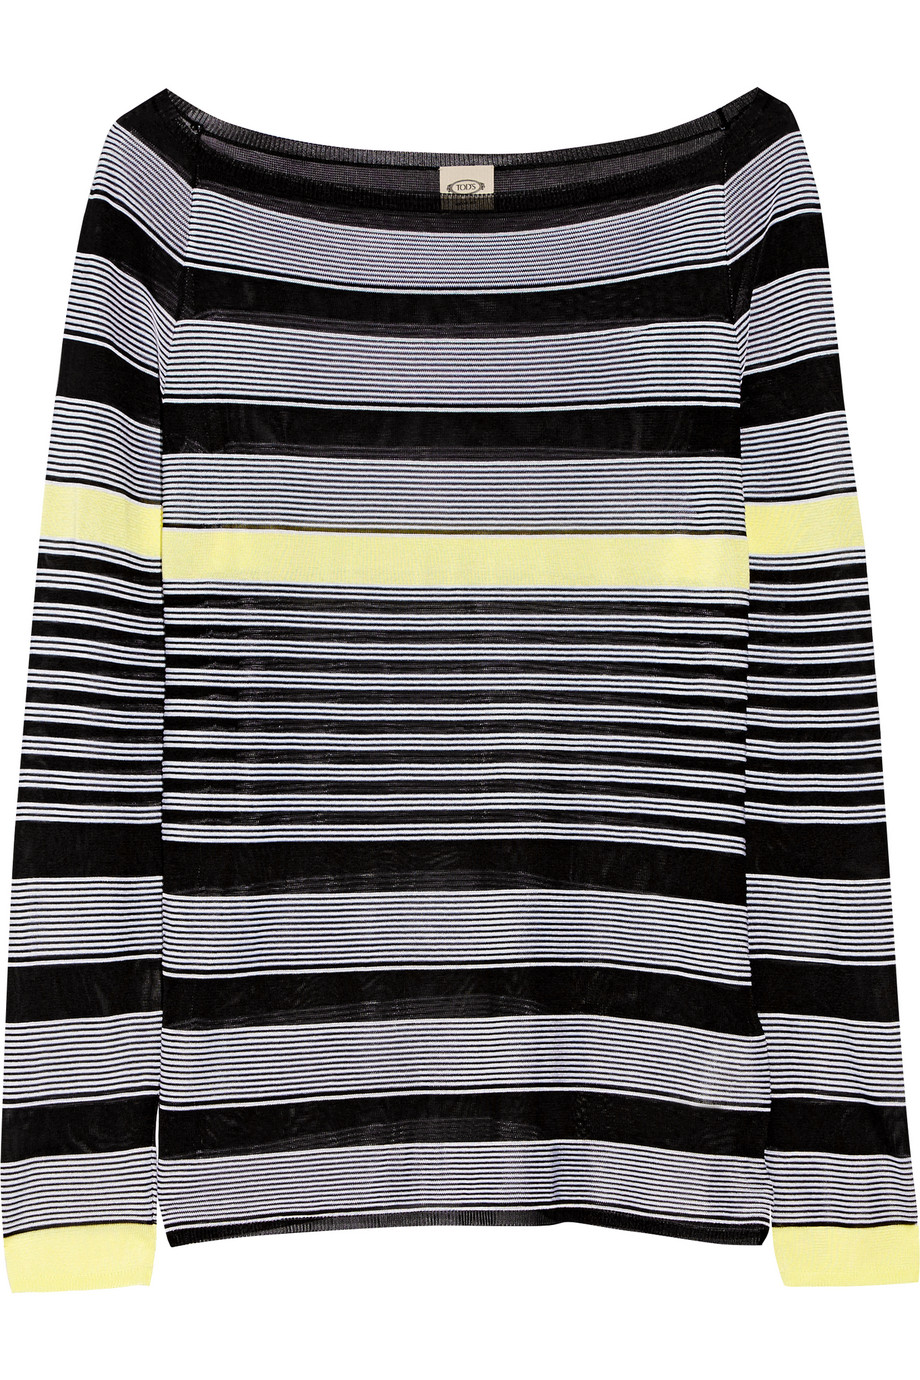 Tod's Striped Stretch-Knit Sweater, Black, Women's, Size: L